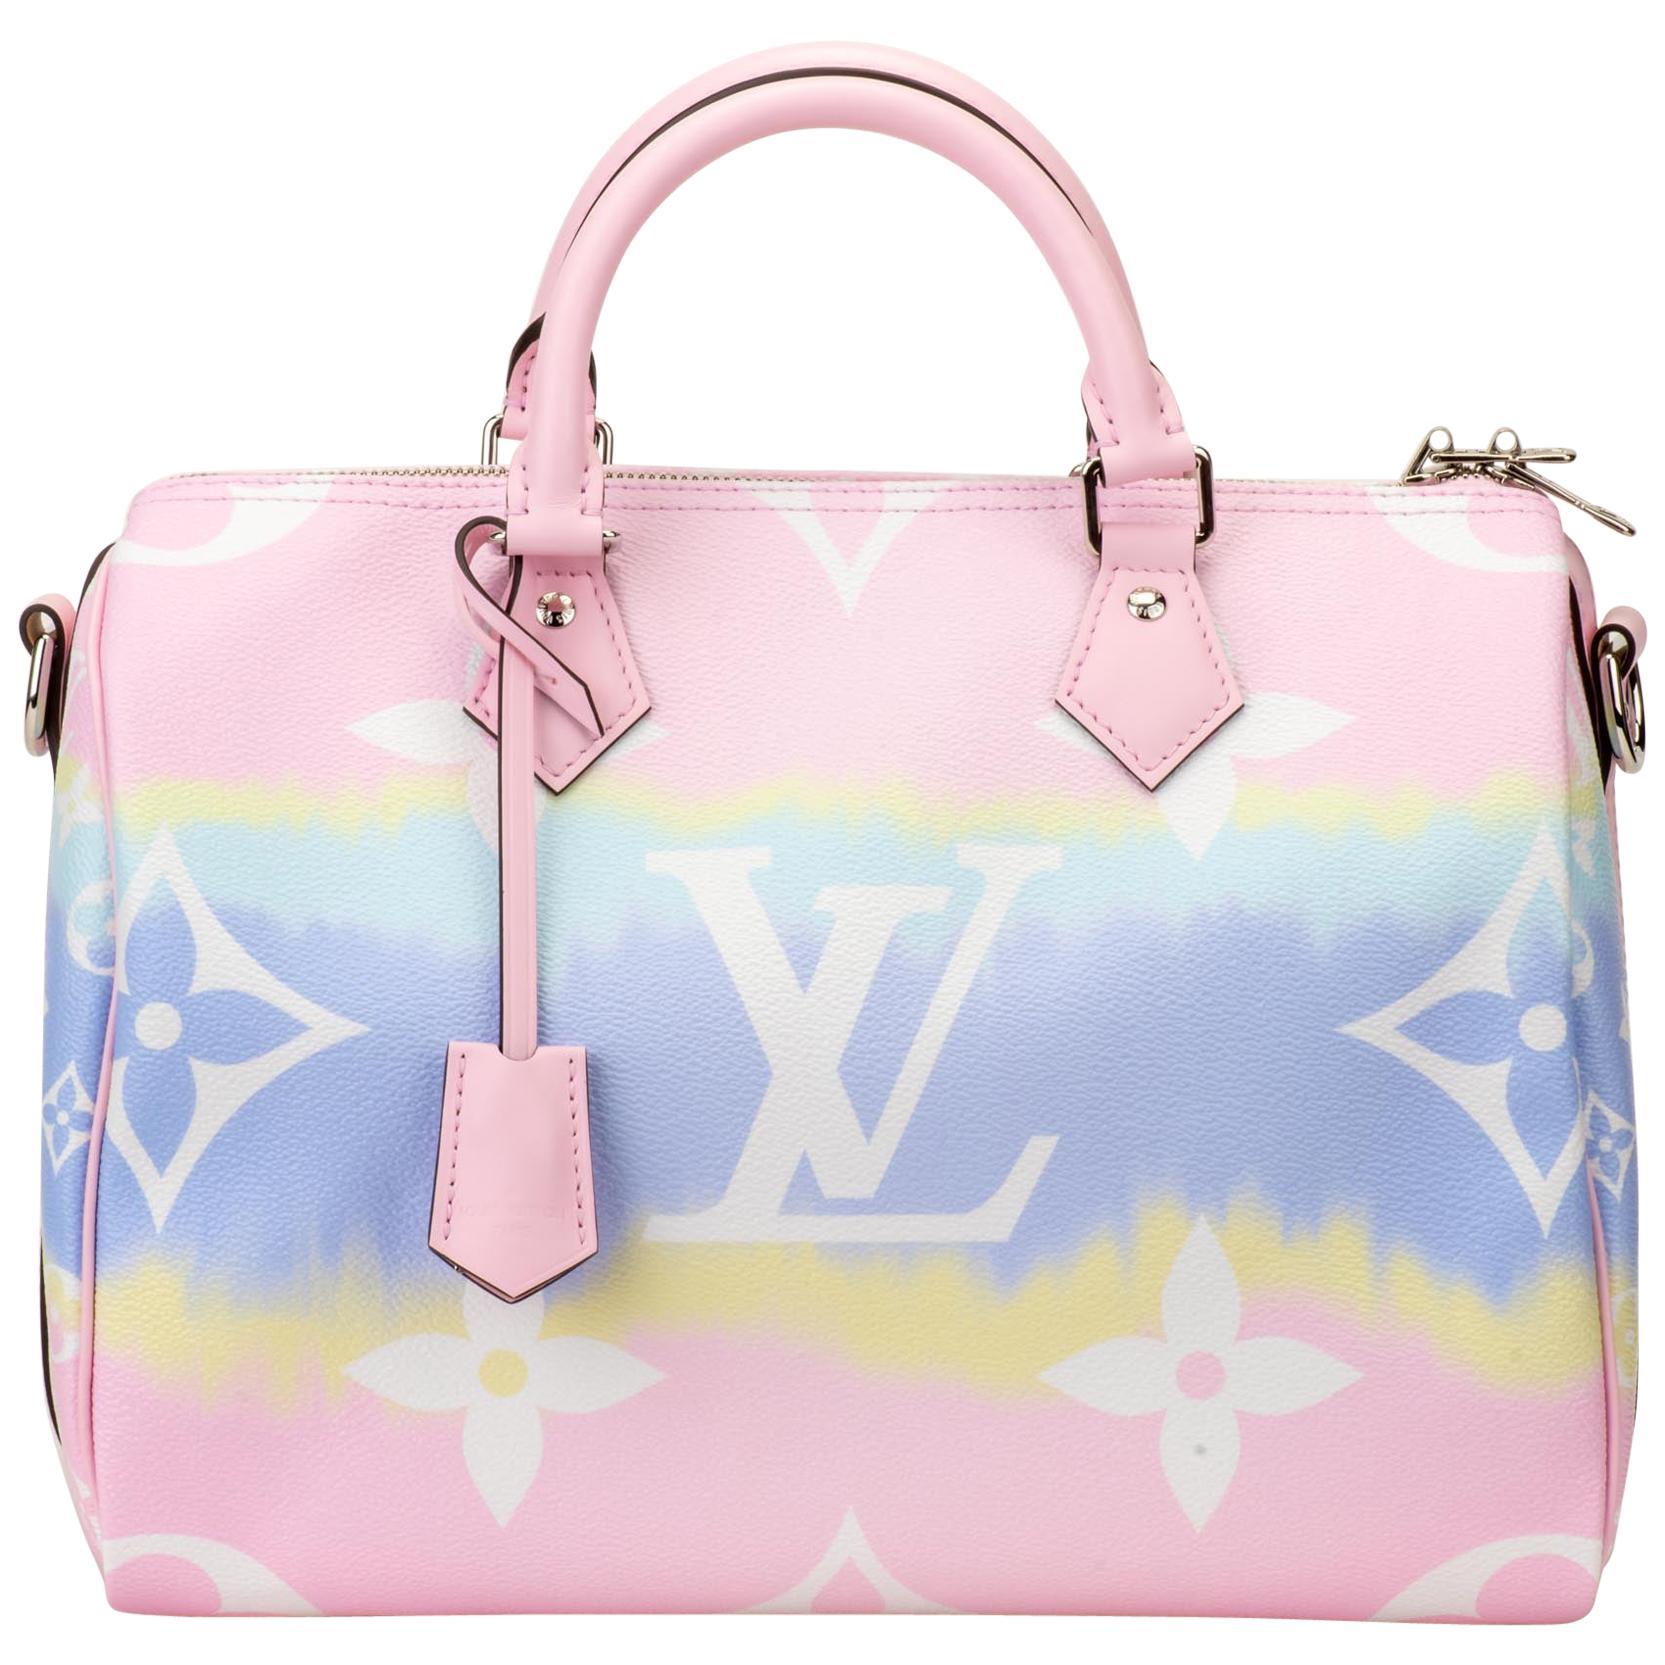 New in Box Louis Vuitton Escale Speedy 30 Bag